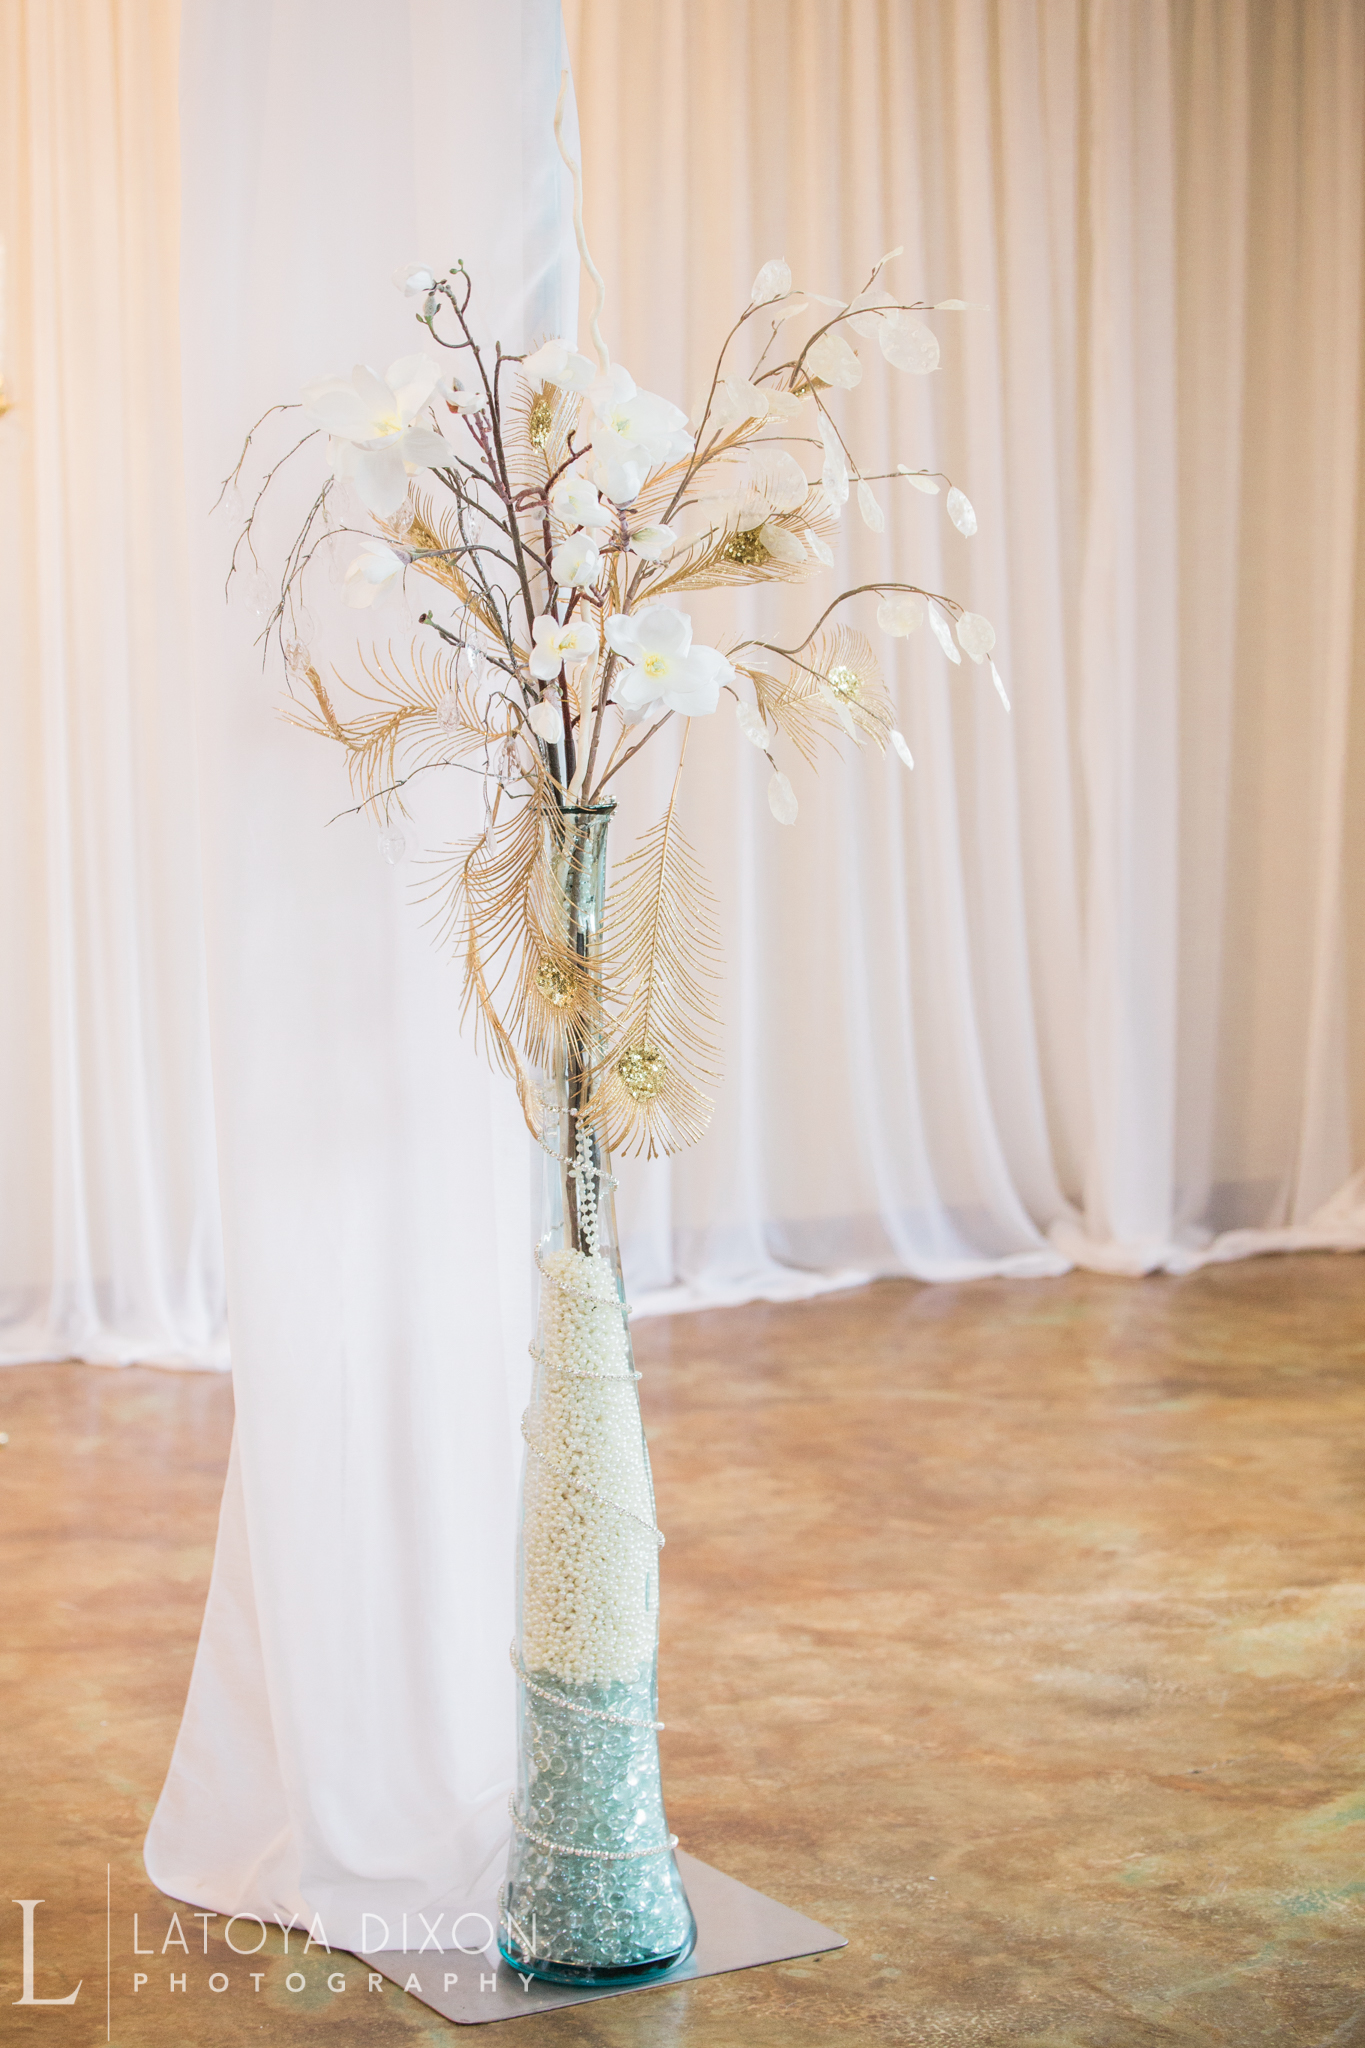 Latoya Dixon Photography Greenville SC Wedding Photographer